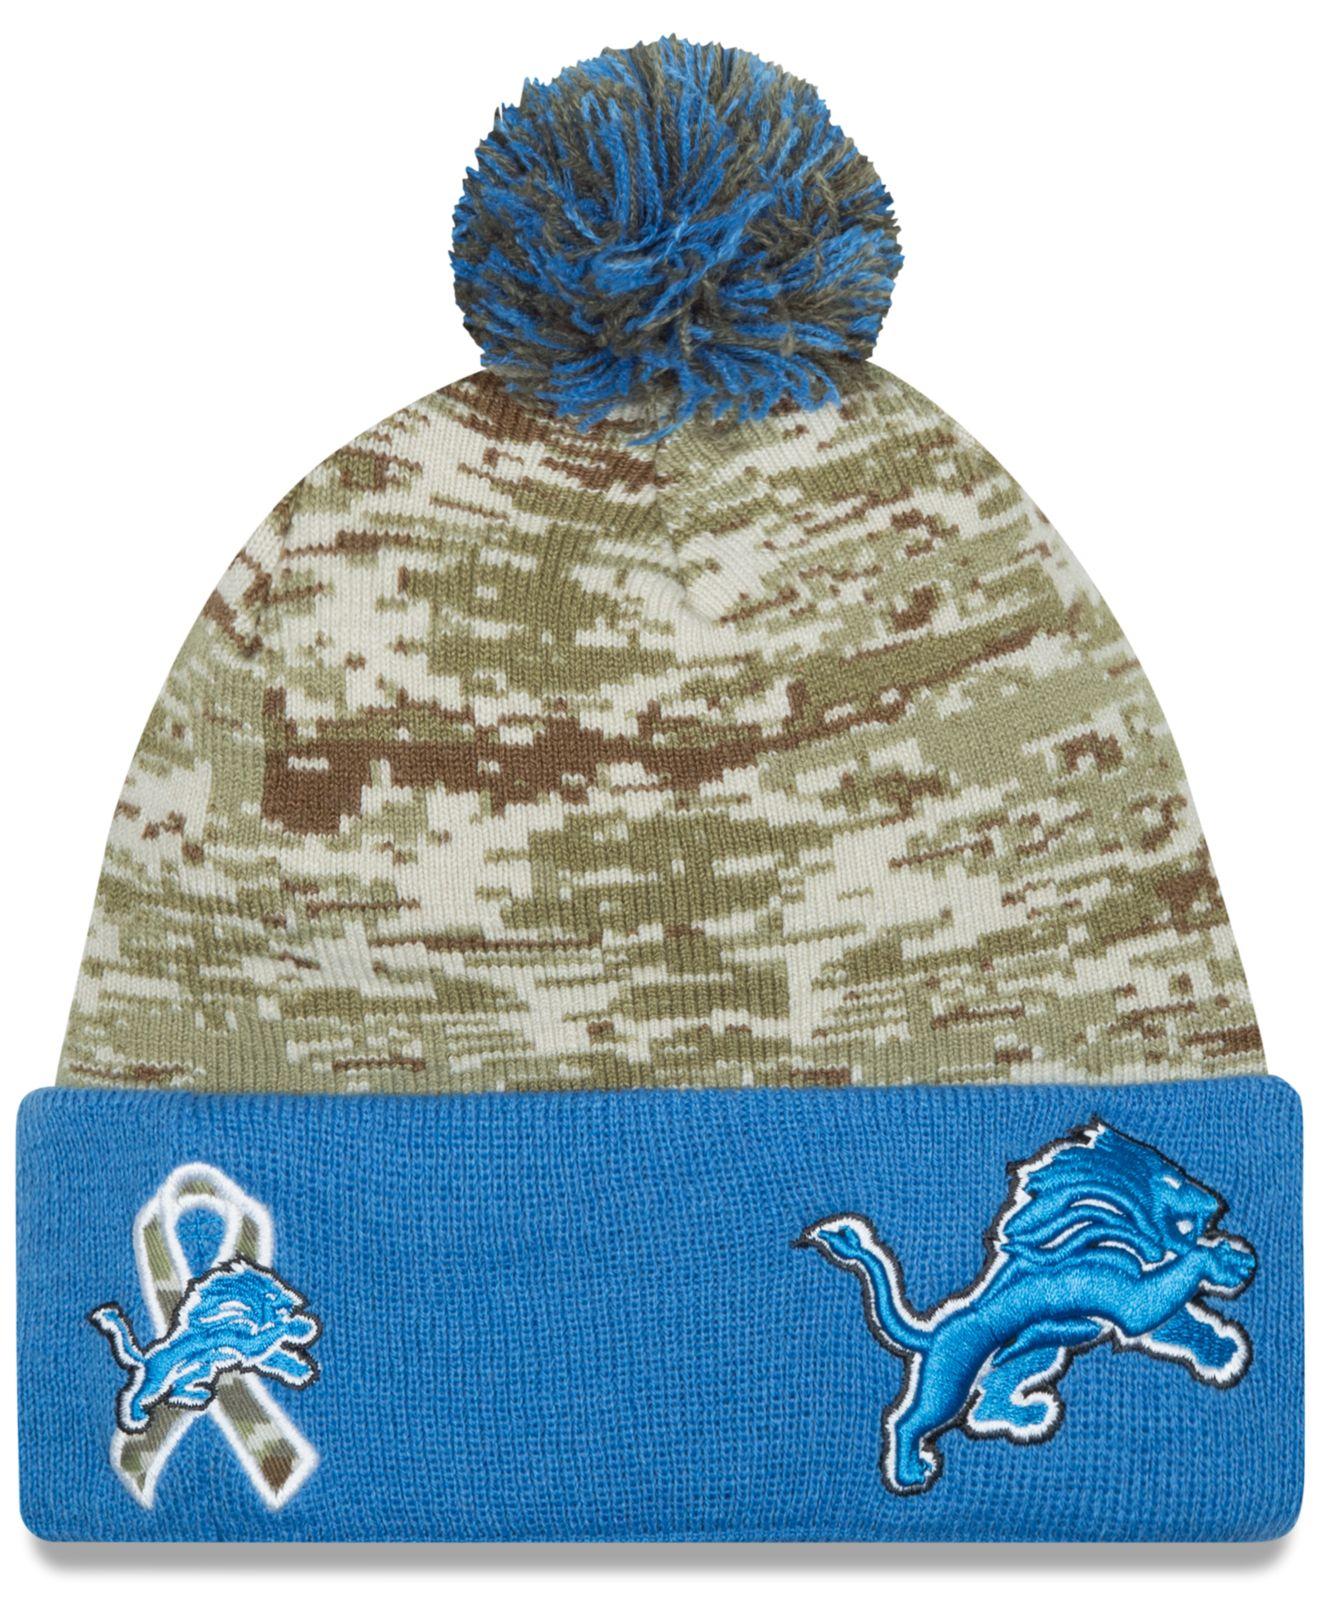 2a6beba3 canada detroit lions pom hat b764e 65a47